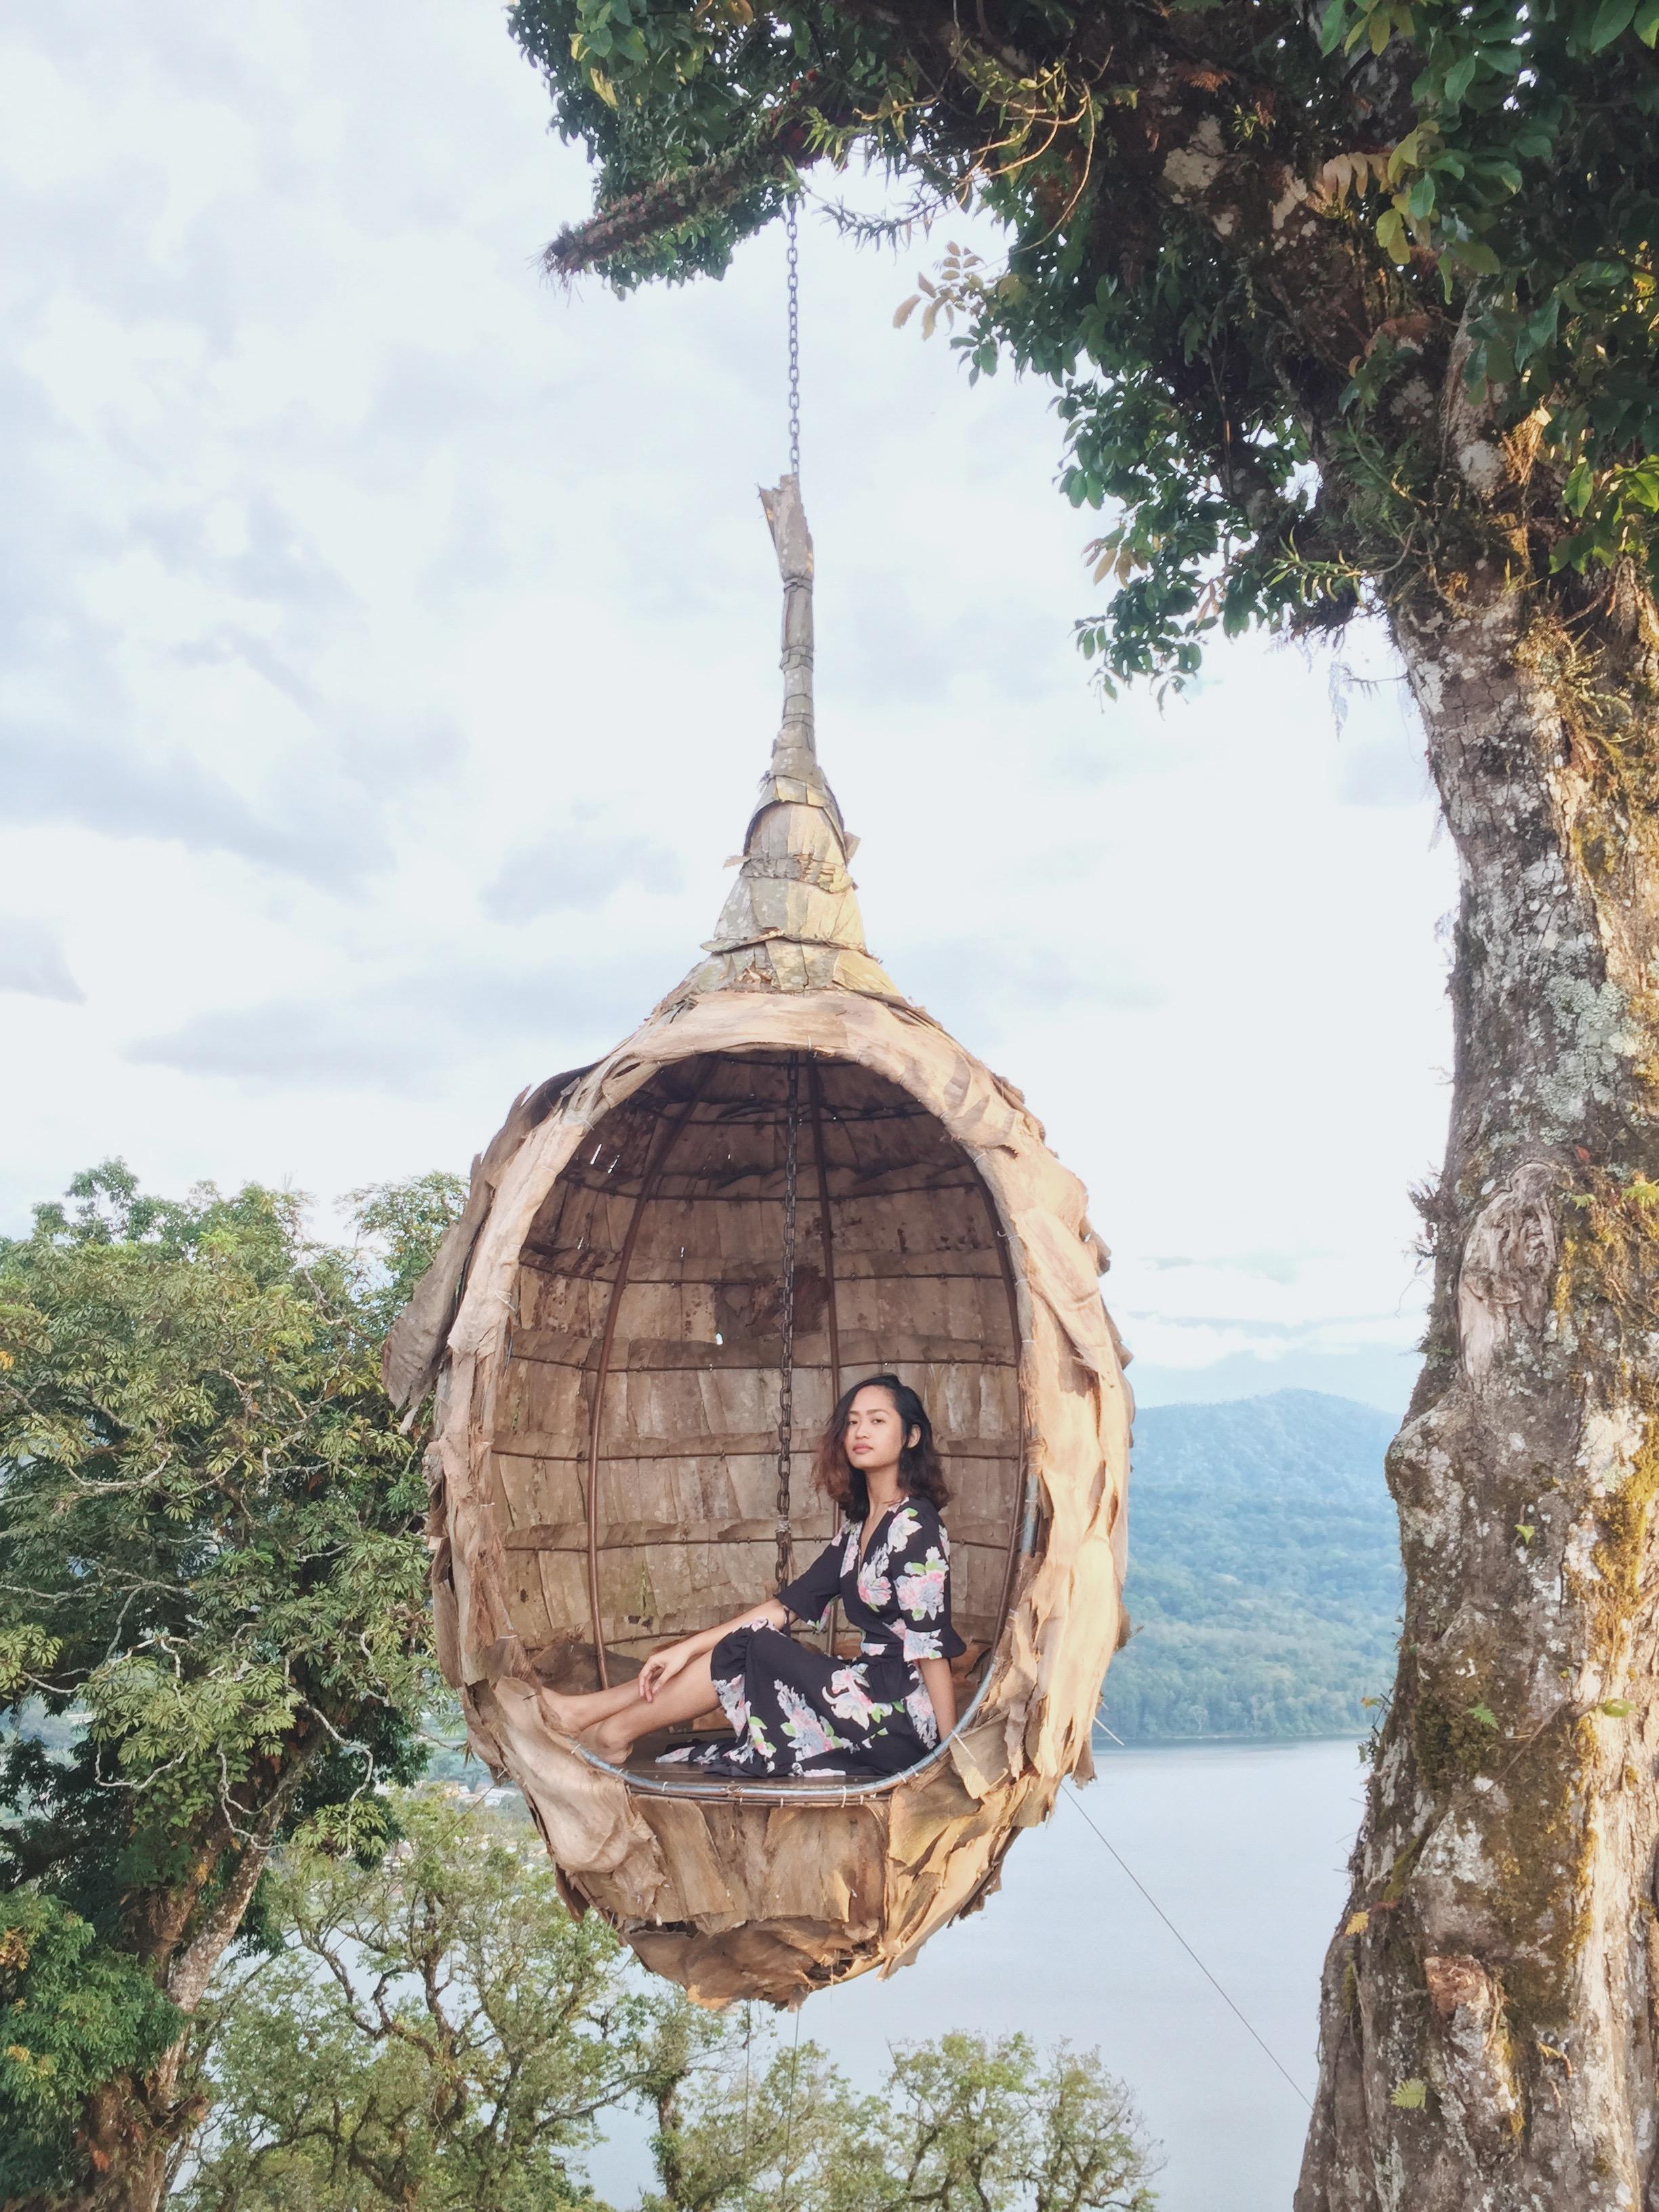 taken at  hidden wanagiri hill, bali . See more travel photos here:   @bautistafh